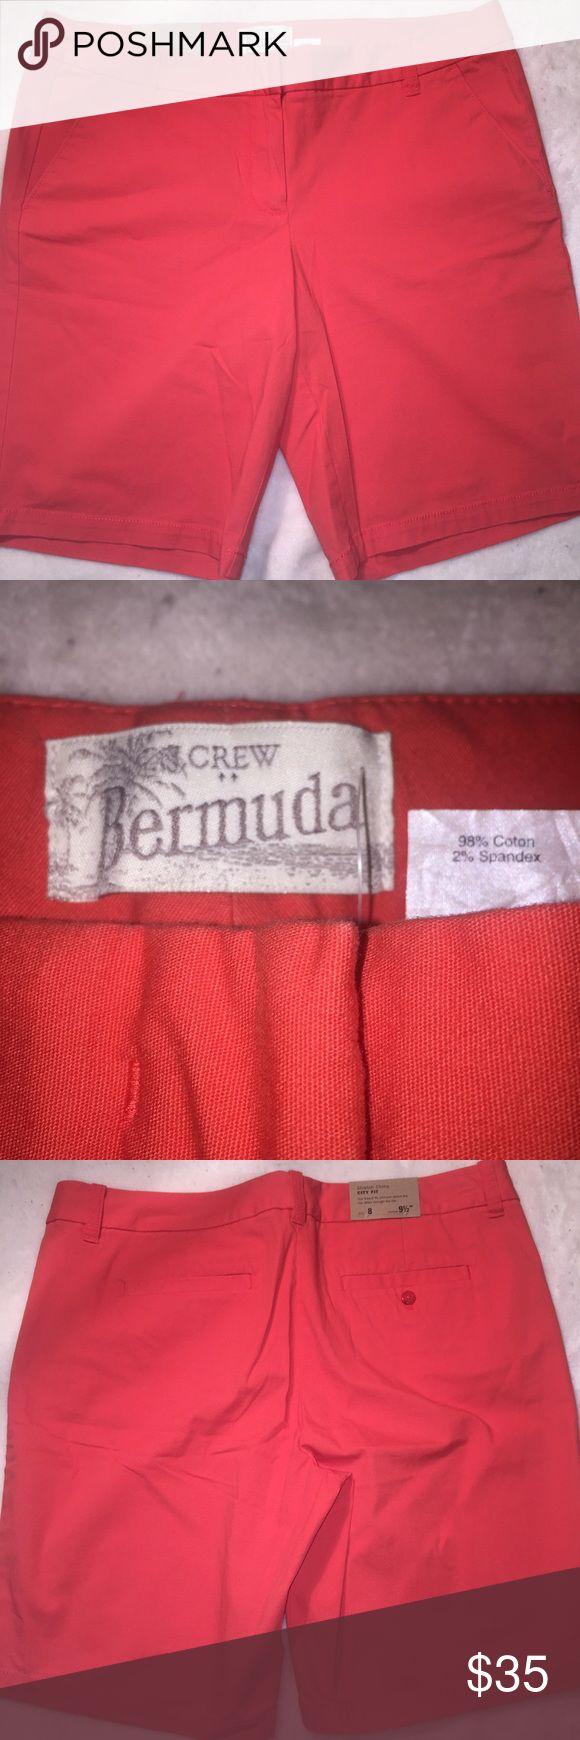 J Crew Factory orange shorts size 8 Brand new j Crew factory Bermuda city fit stretch chino short. Size 8 9 1/2 inseam. J. Crew Factory Shorts Bermudas